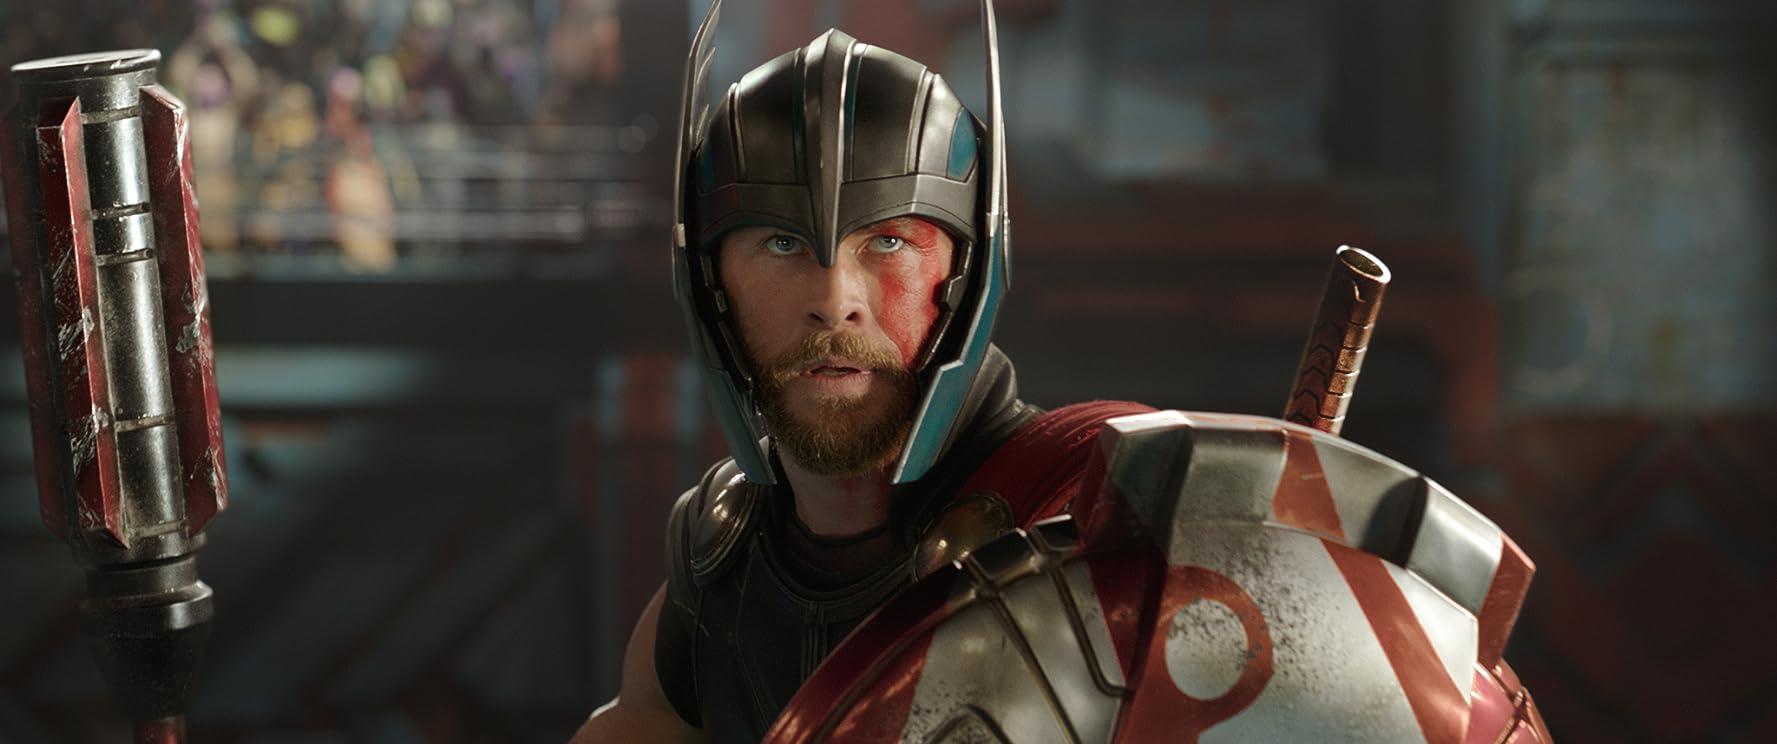 Chris Hemsworth in Thor: Ragnarok (2017)